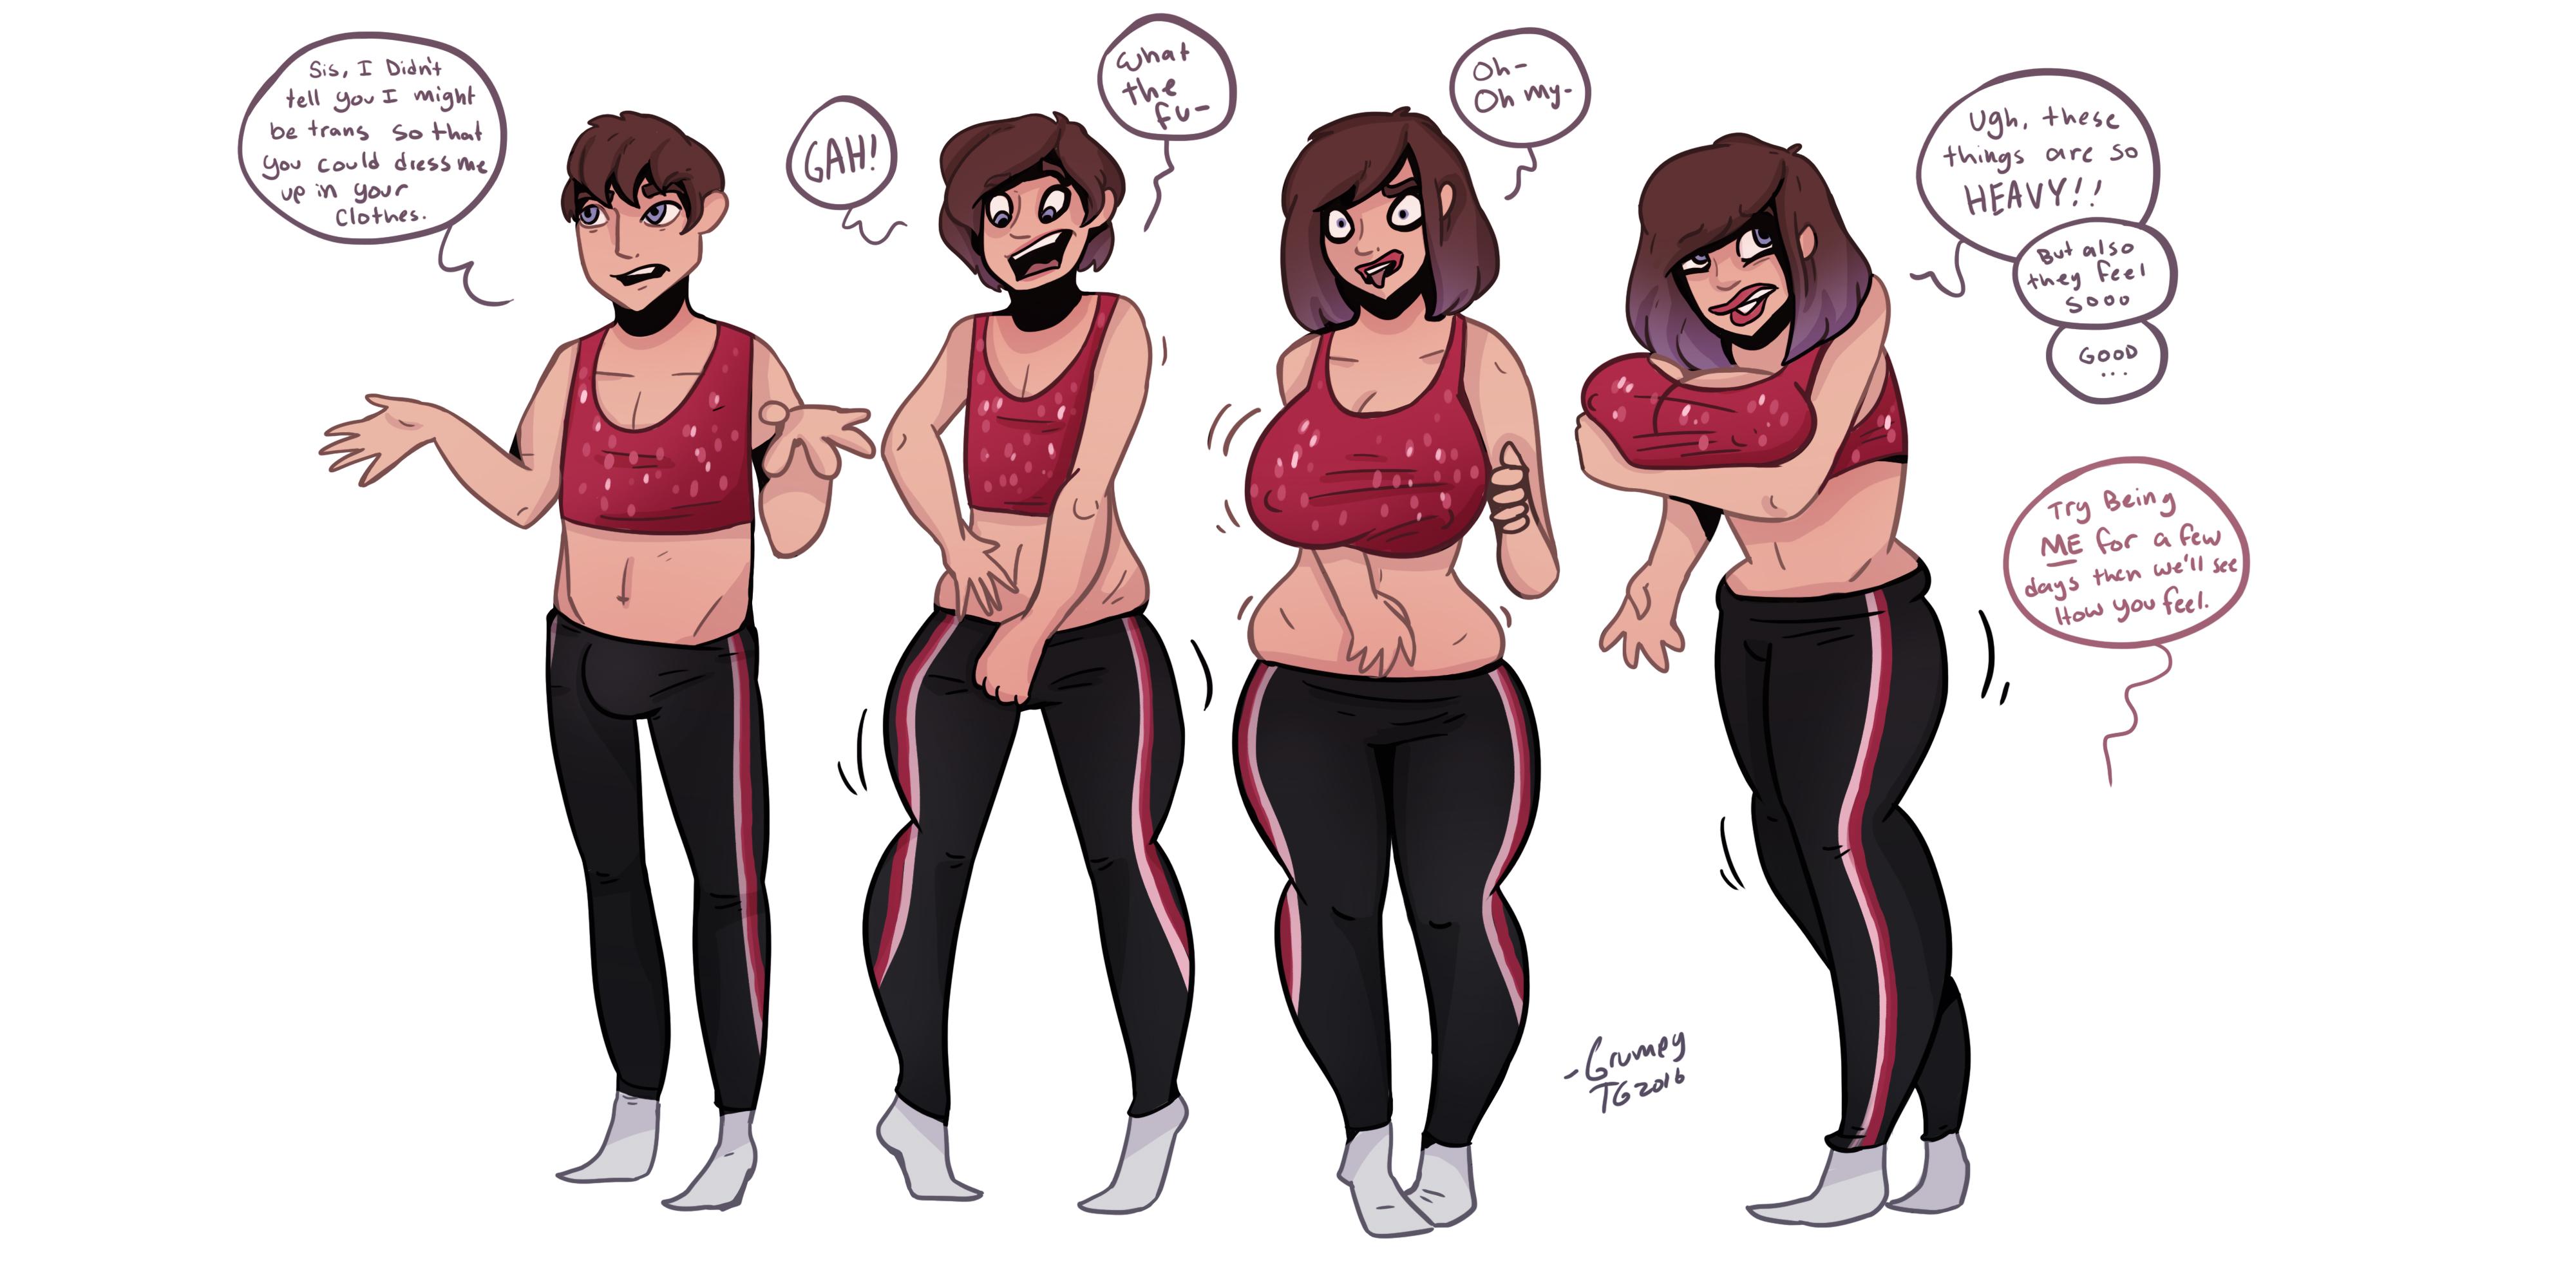 Love big boob and gender belt she's